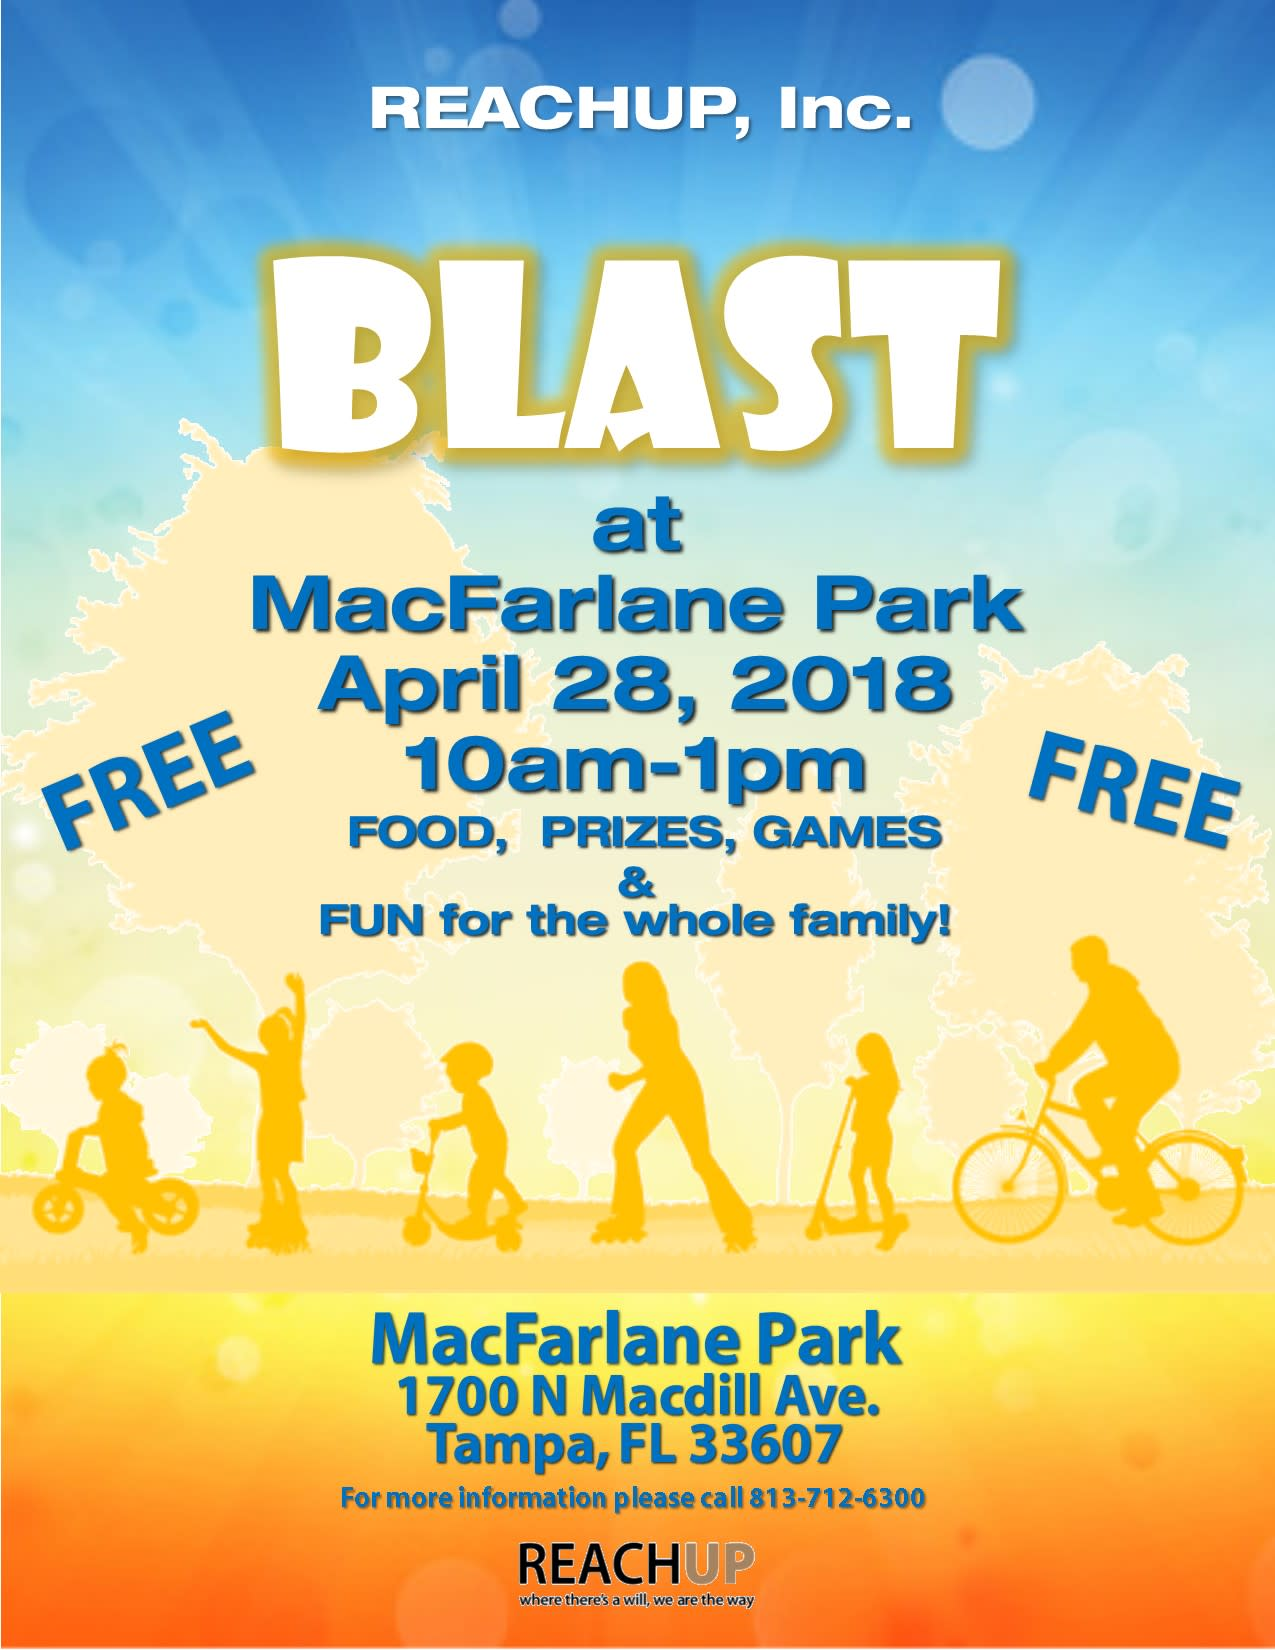 REACHUP, Inc. Blast at MacFarlane Park